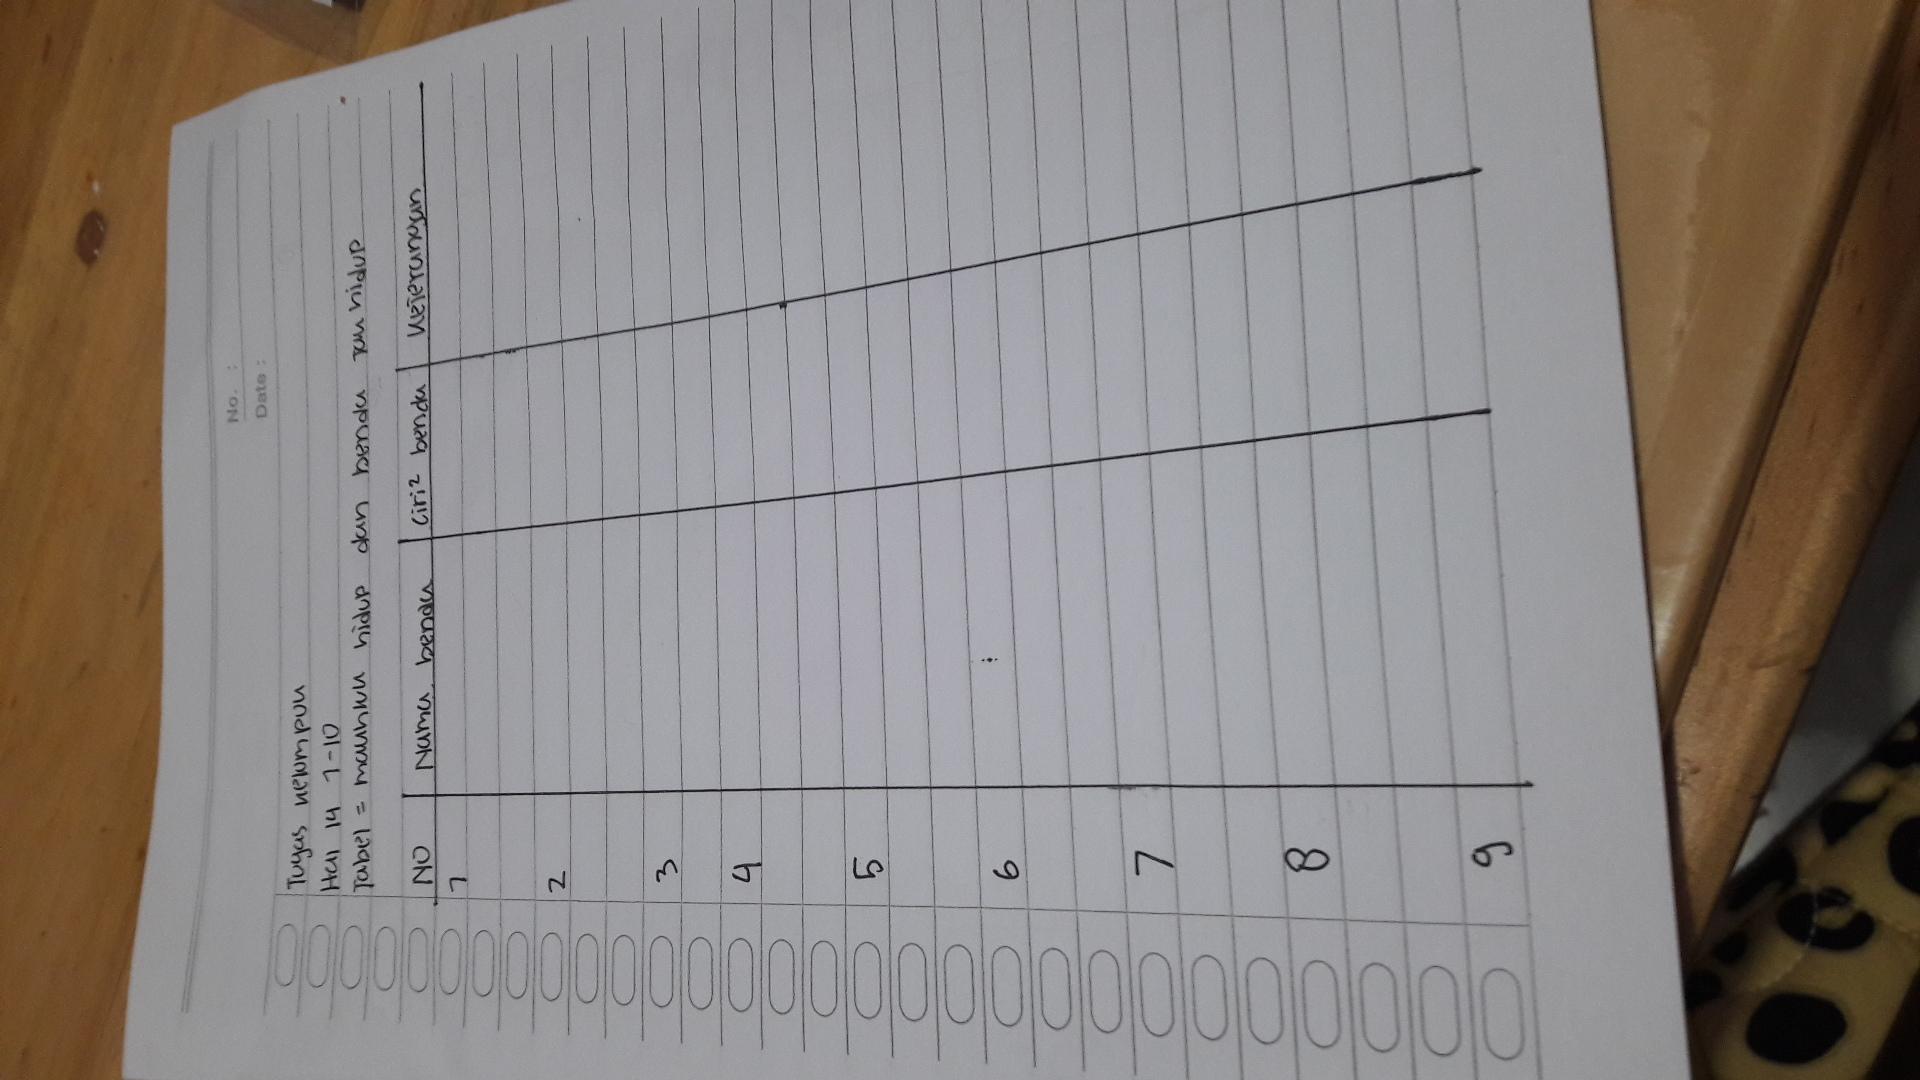 Uji Kompetensi Ipa Kelas 7 Hal 89 Guru Ilmu Sosial